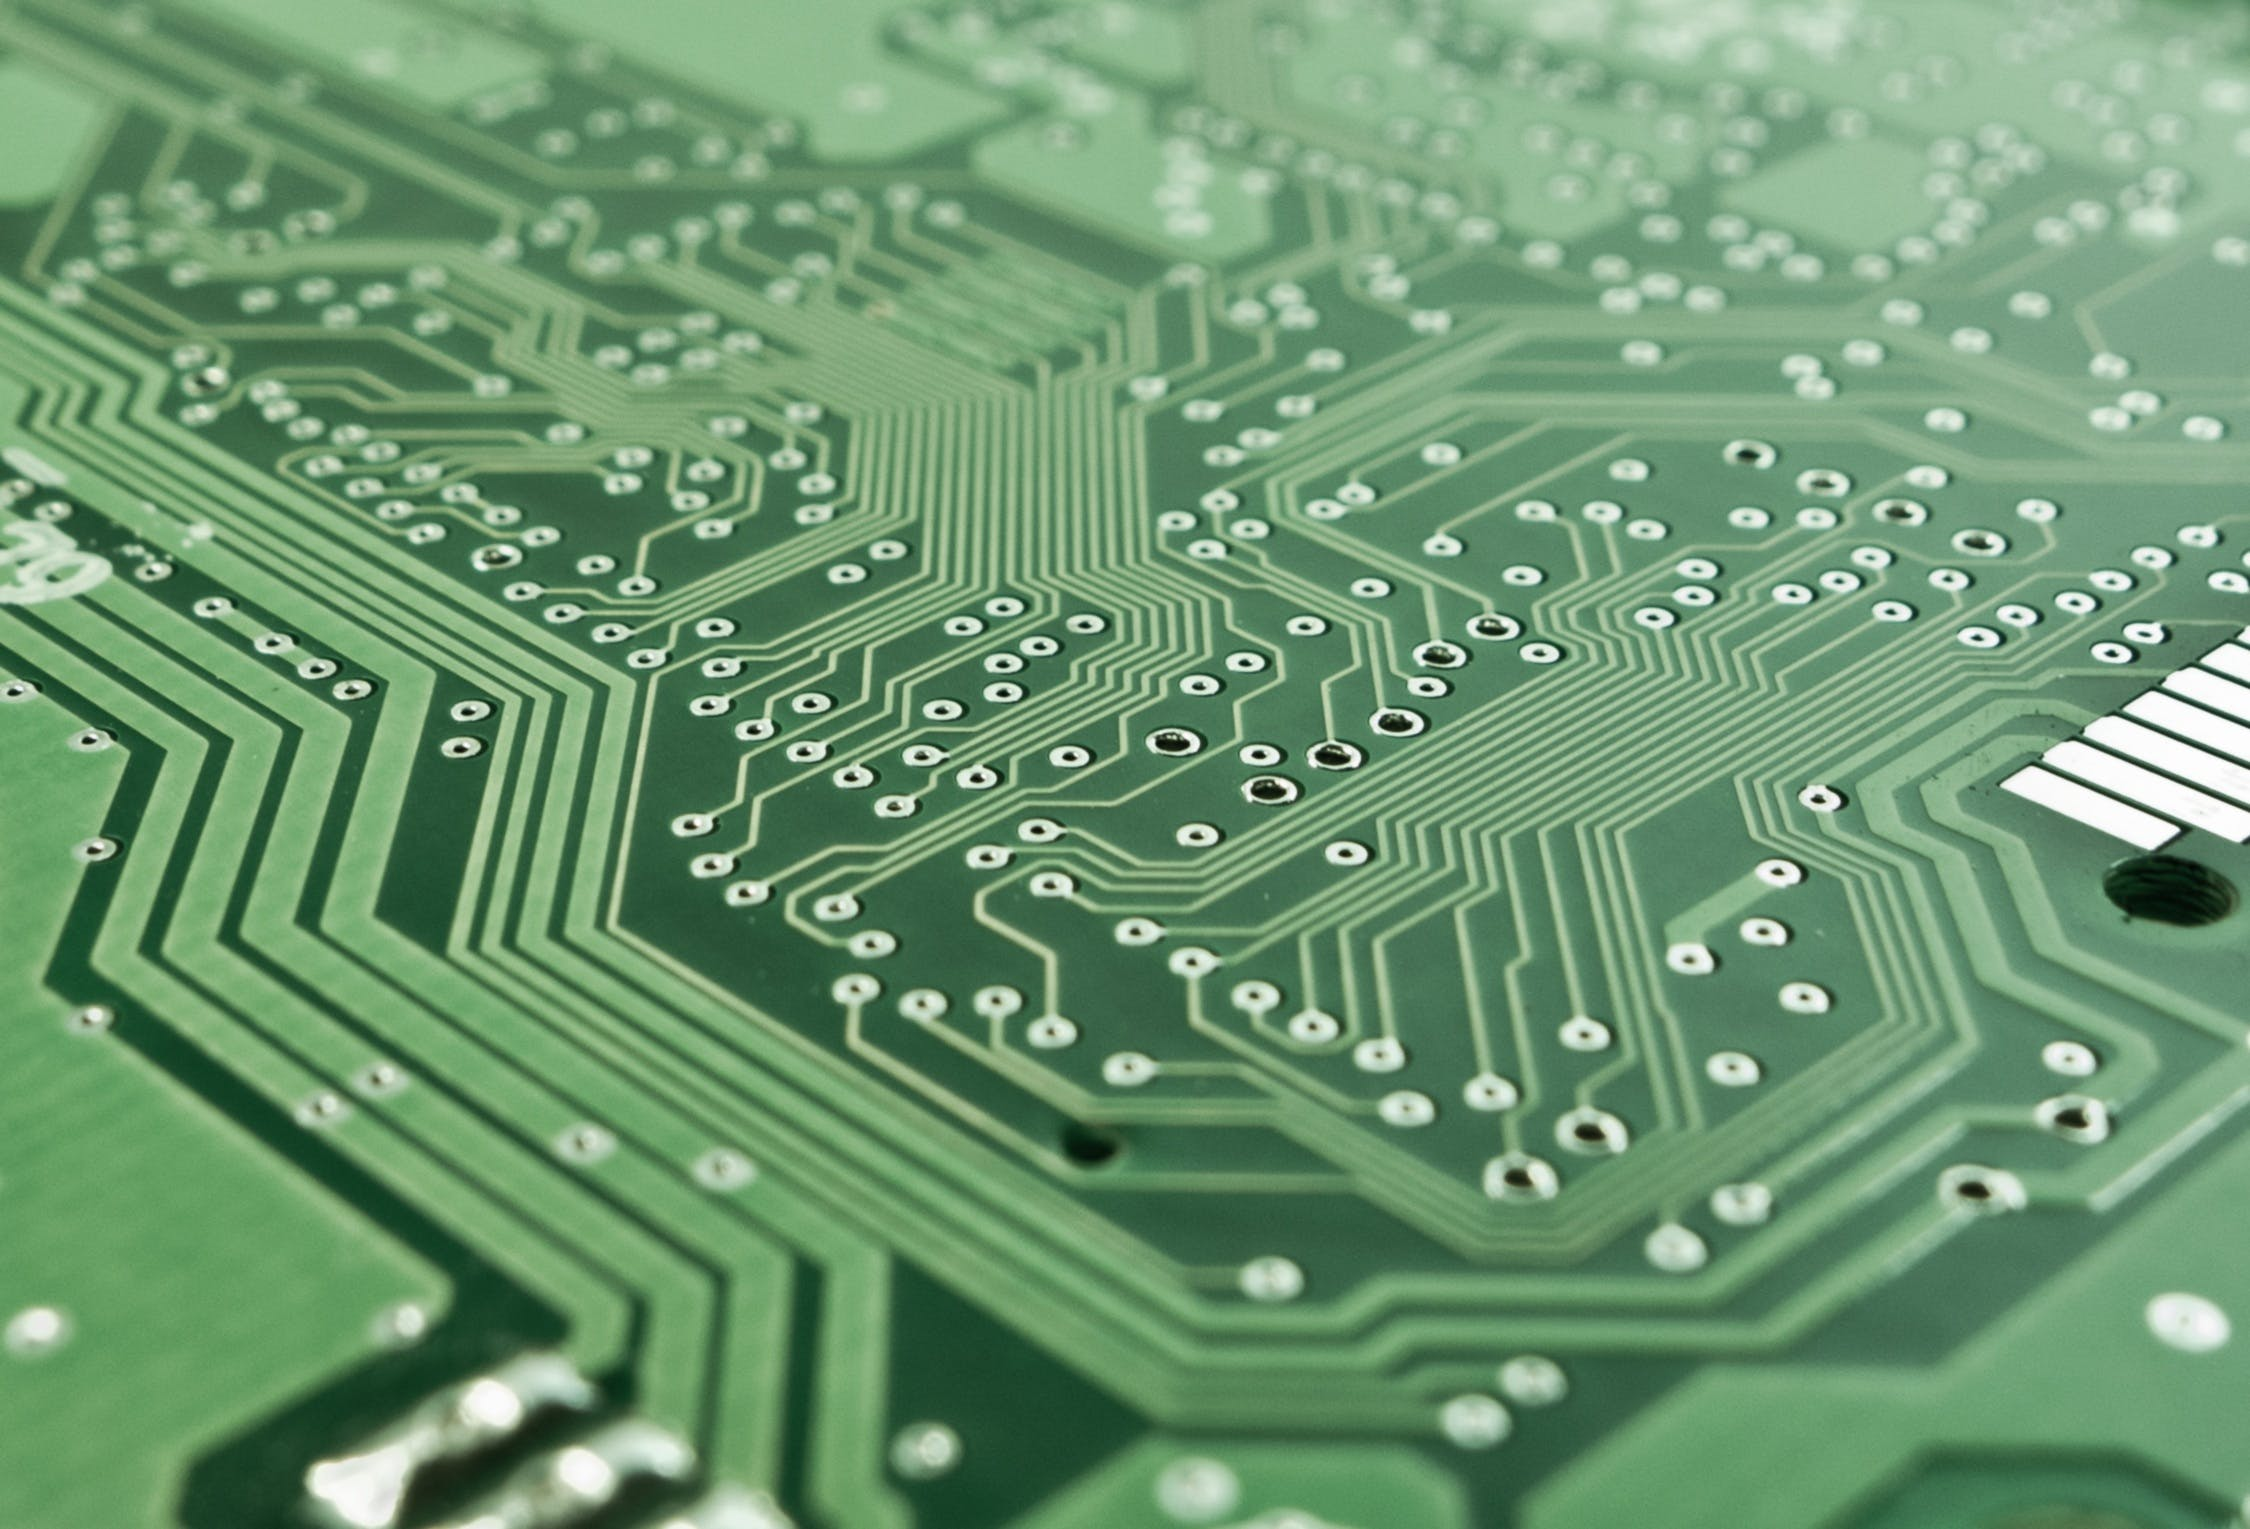 Fotos de stock gratuitas de CPU, electrónico, hardware, informática